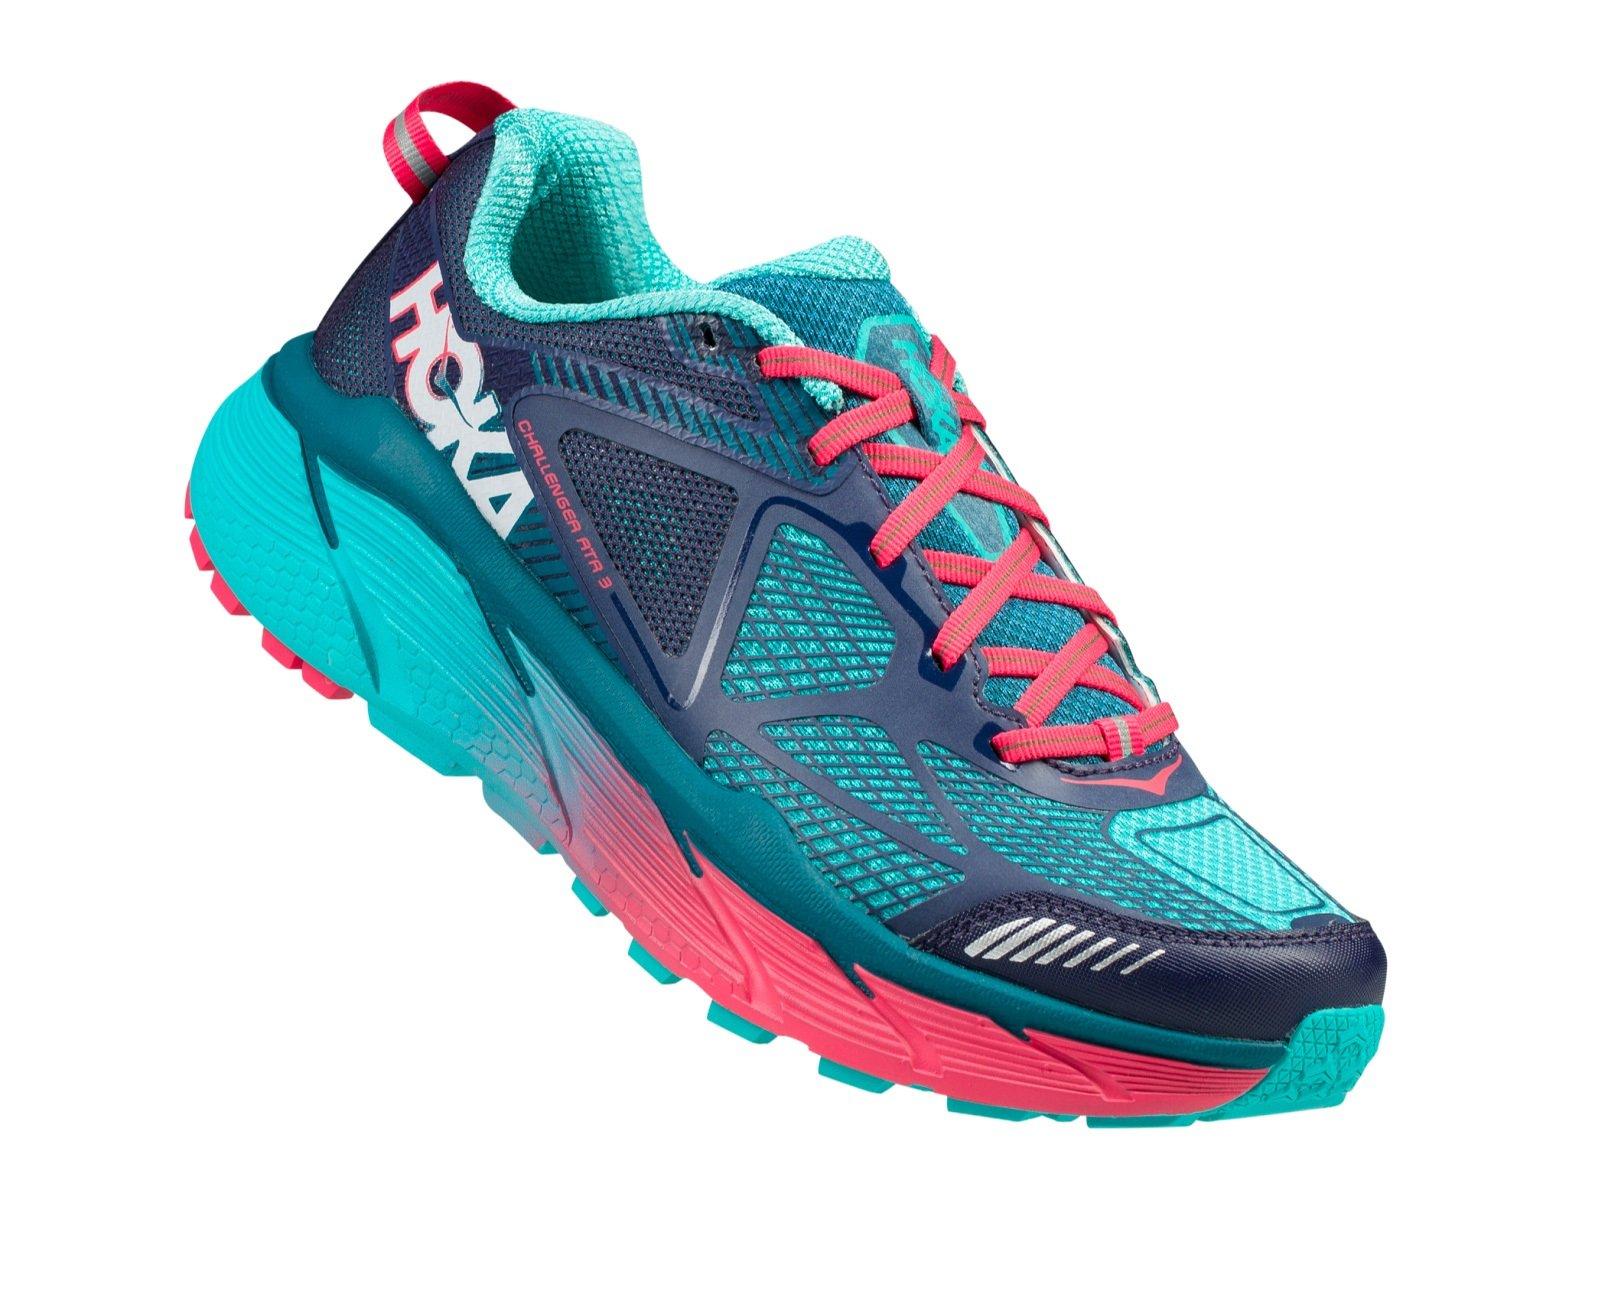 Hoka One One Challenger ATR 3 Trail Running Shoes - Peacoat/Ceramic - Womens - 6